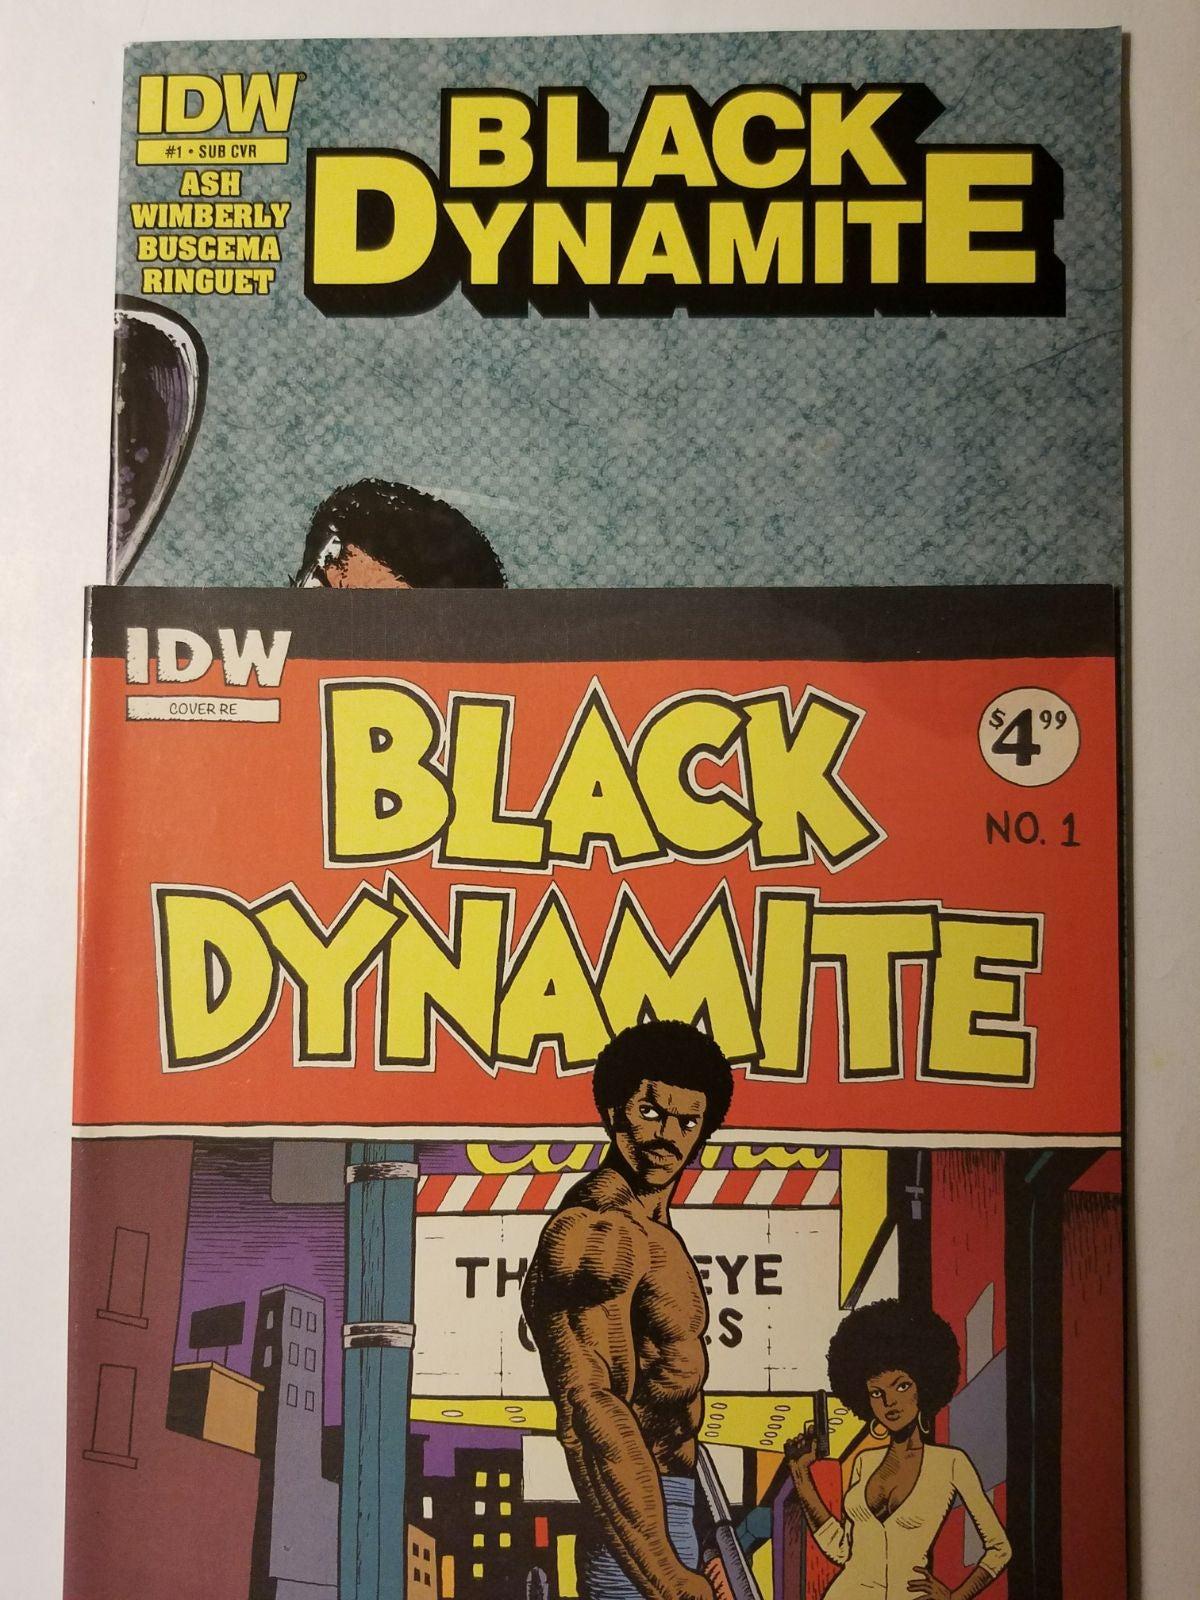 BLACK DYNAMITE #1 variant lot